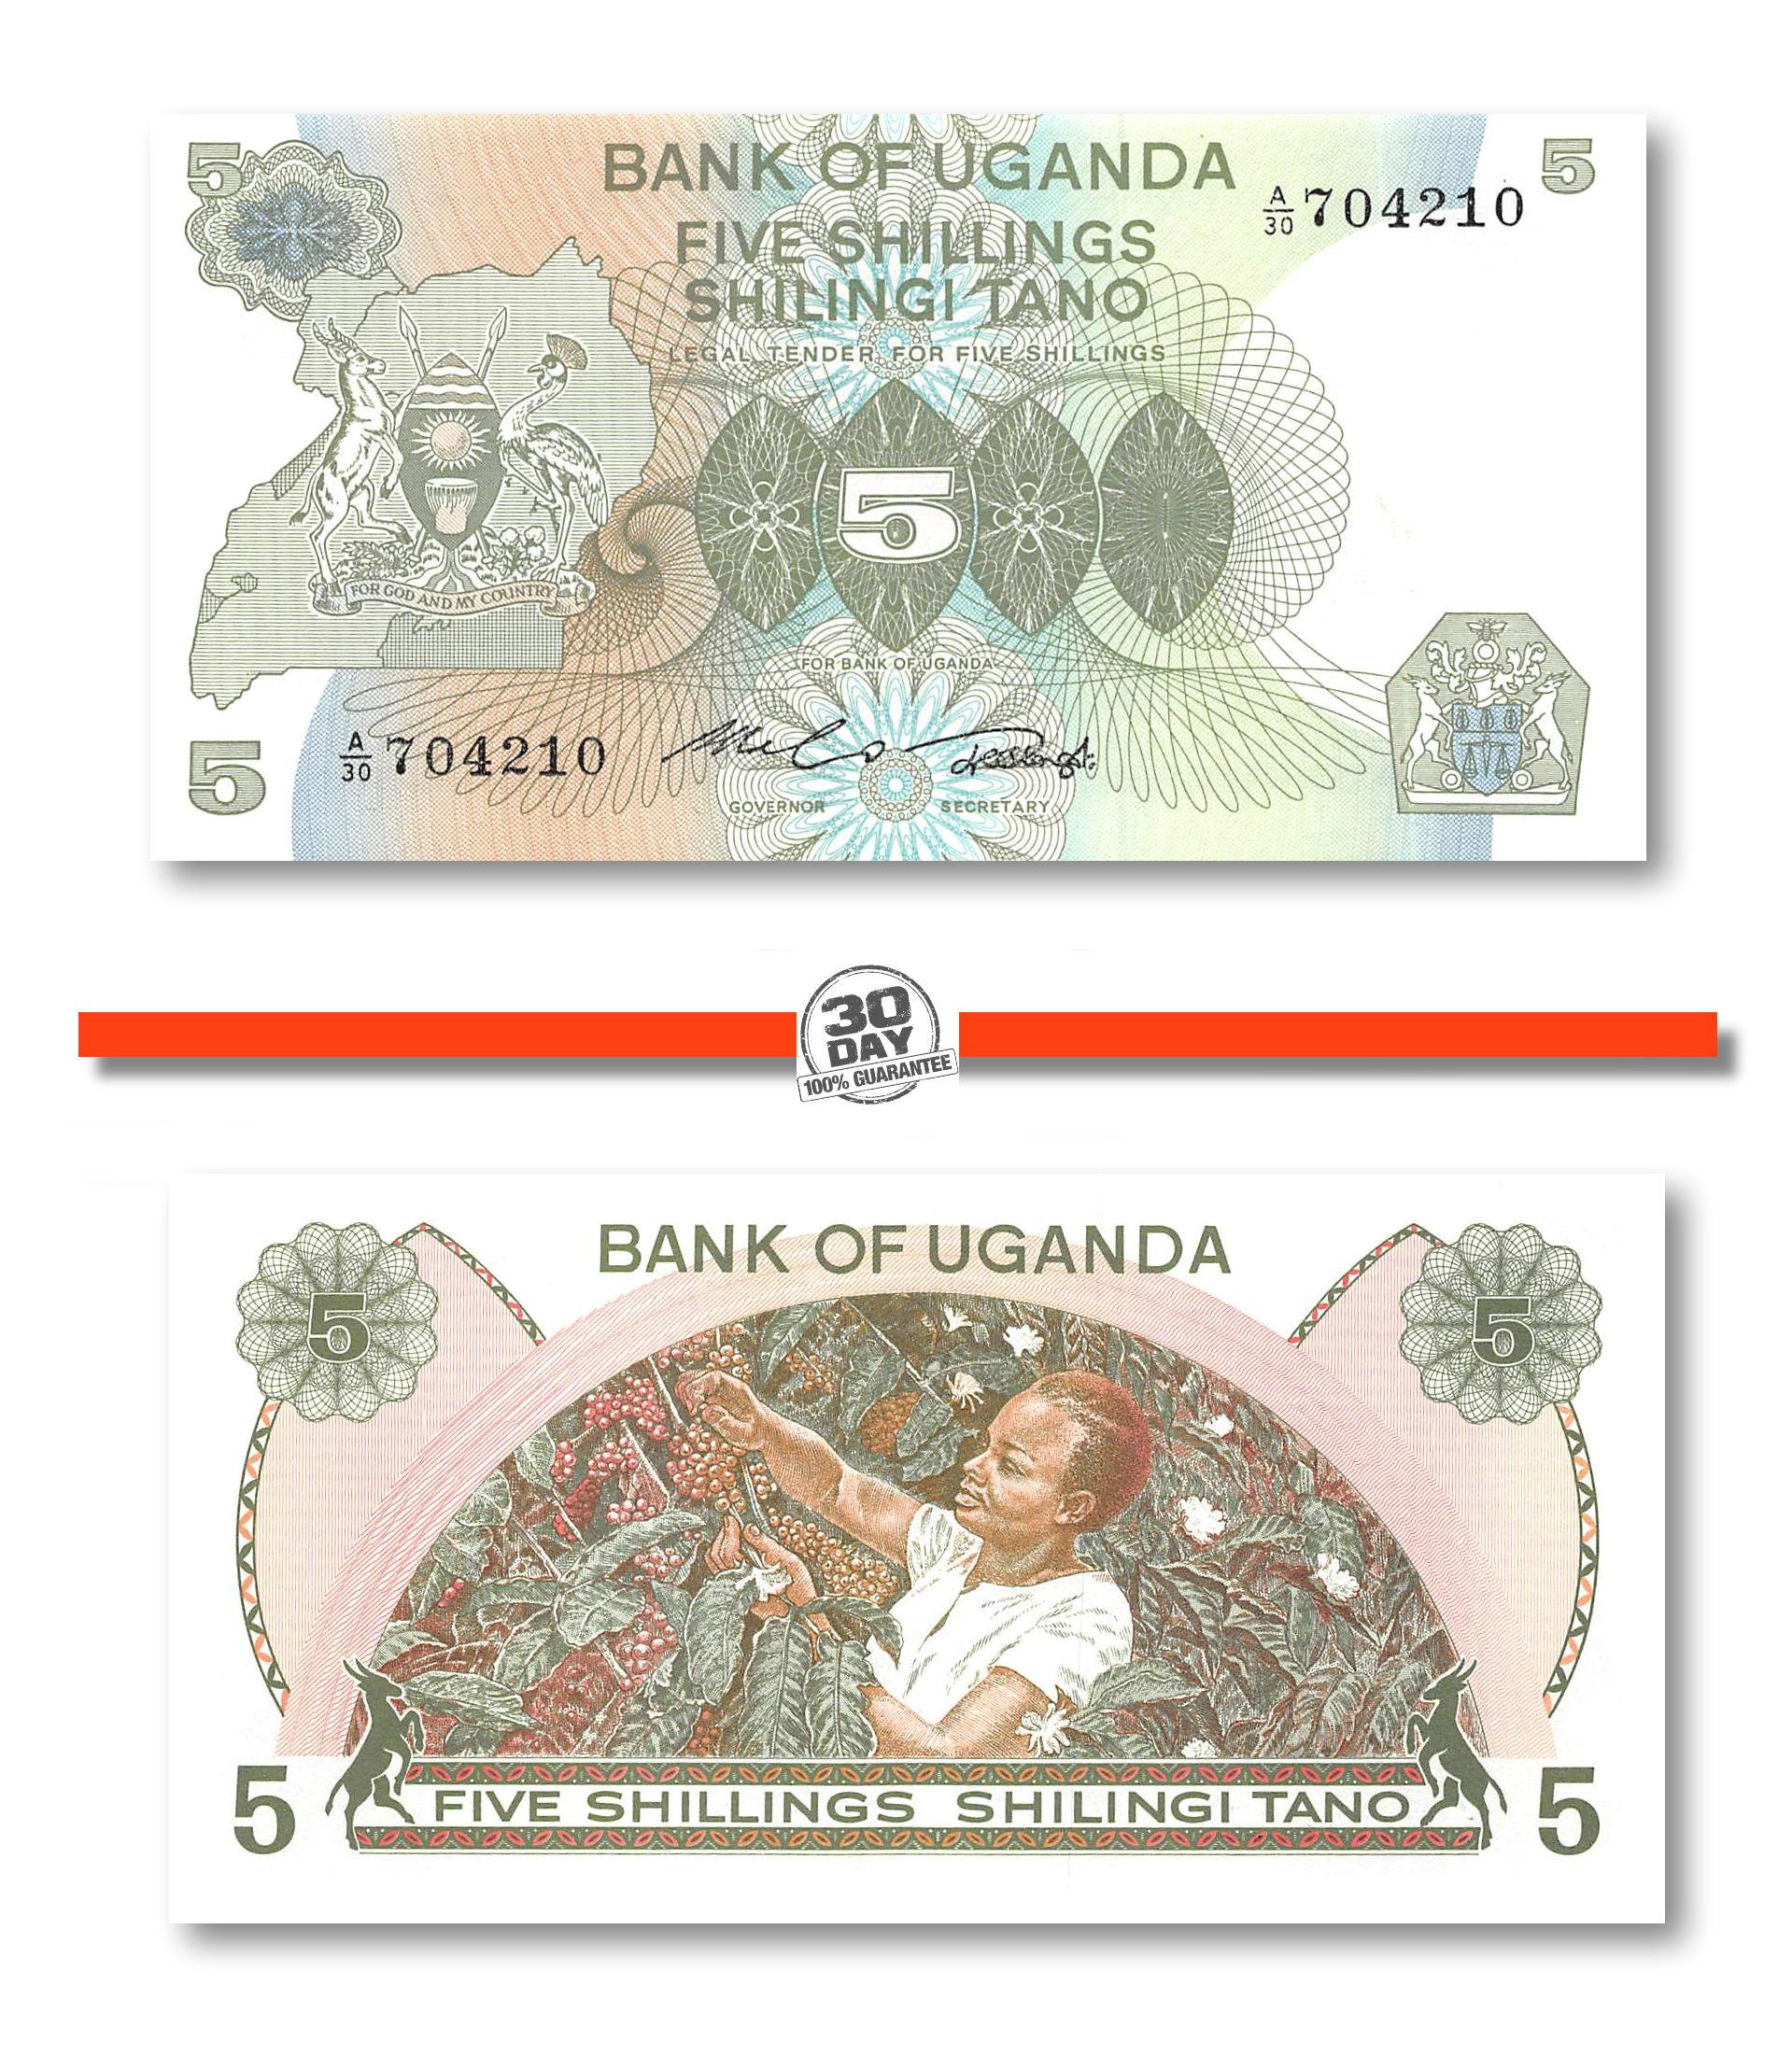 UGANDA 5 SHILLINGS 1982  P 15 UNC